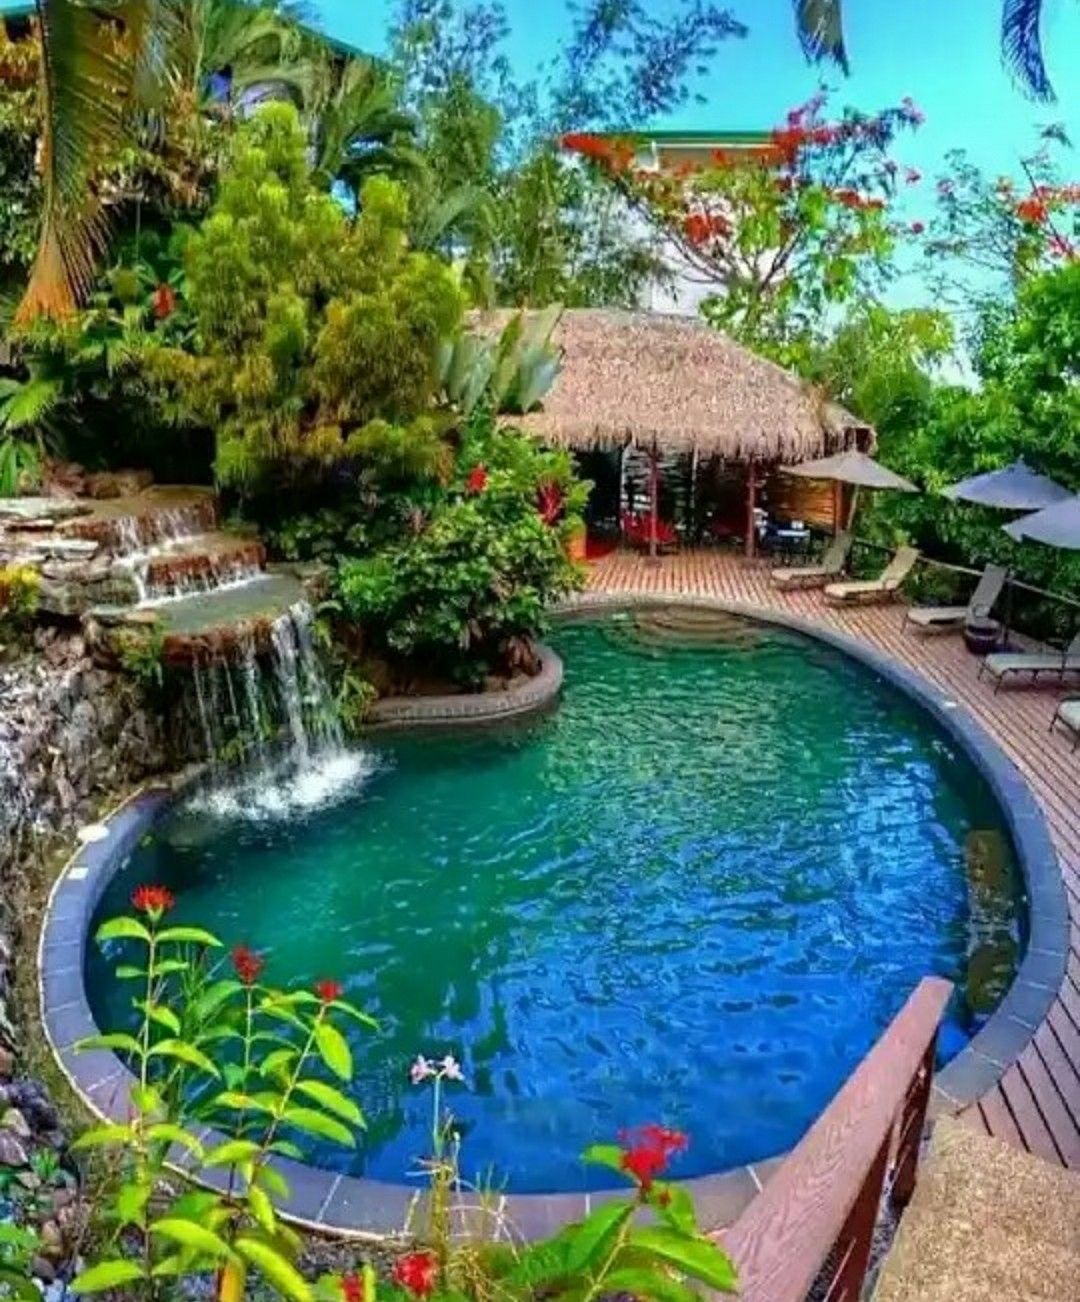 Pin de gl en casas piscine piscines de r ve y belle maison for Casa con piscina fin de semana madrid